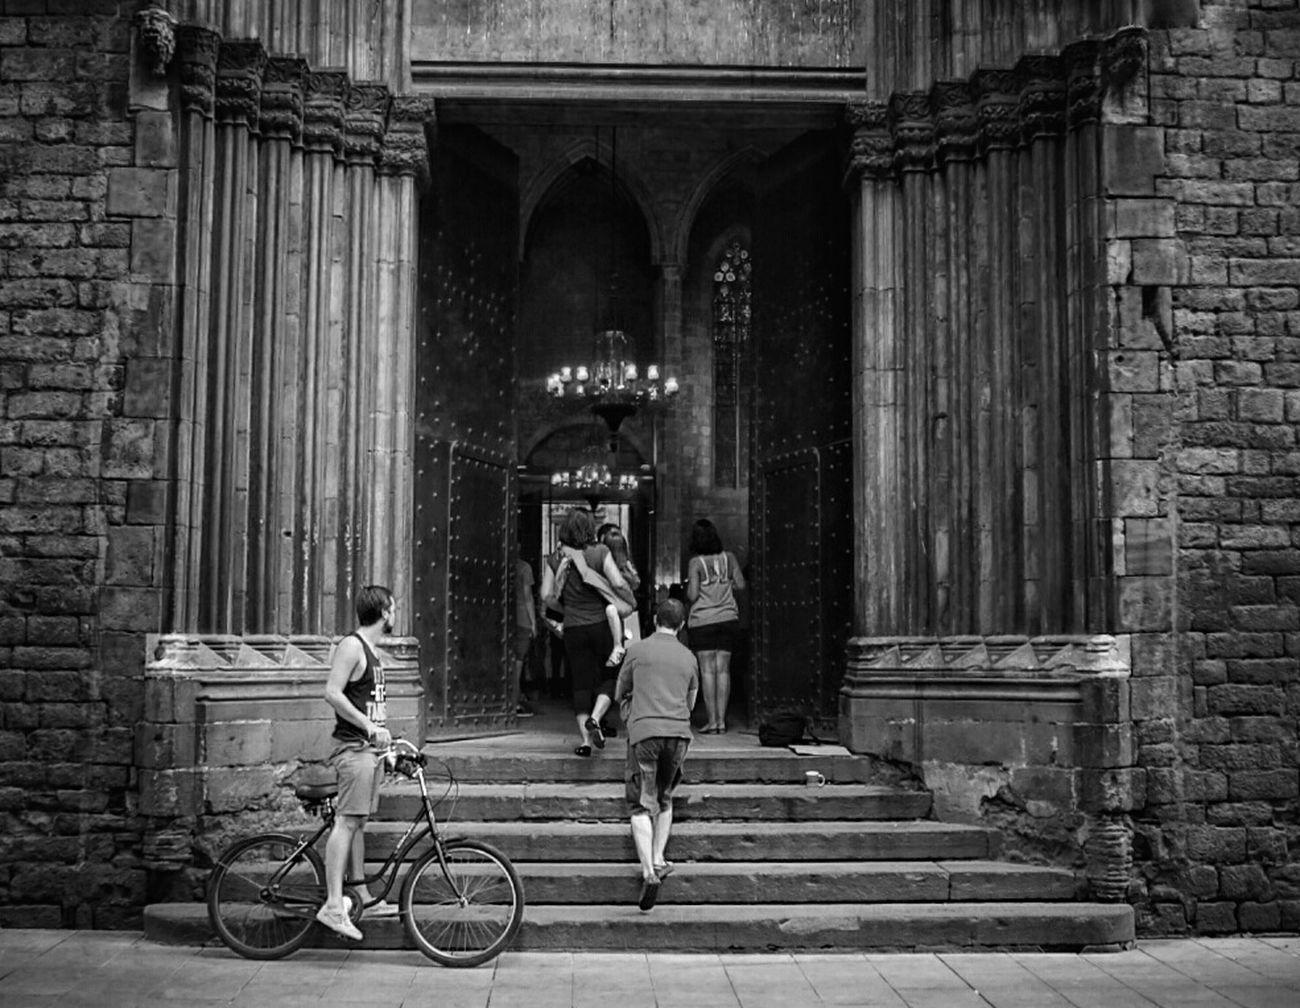 Blackandwhite Shades Of Grey Monochrome Church Bike Door Streetphotography Streetphoto_bw Mi Serie Barcelona